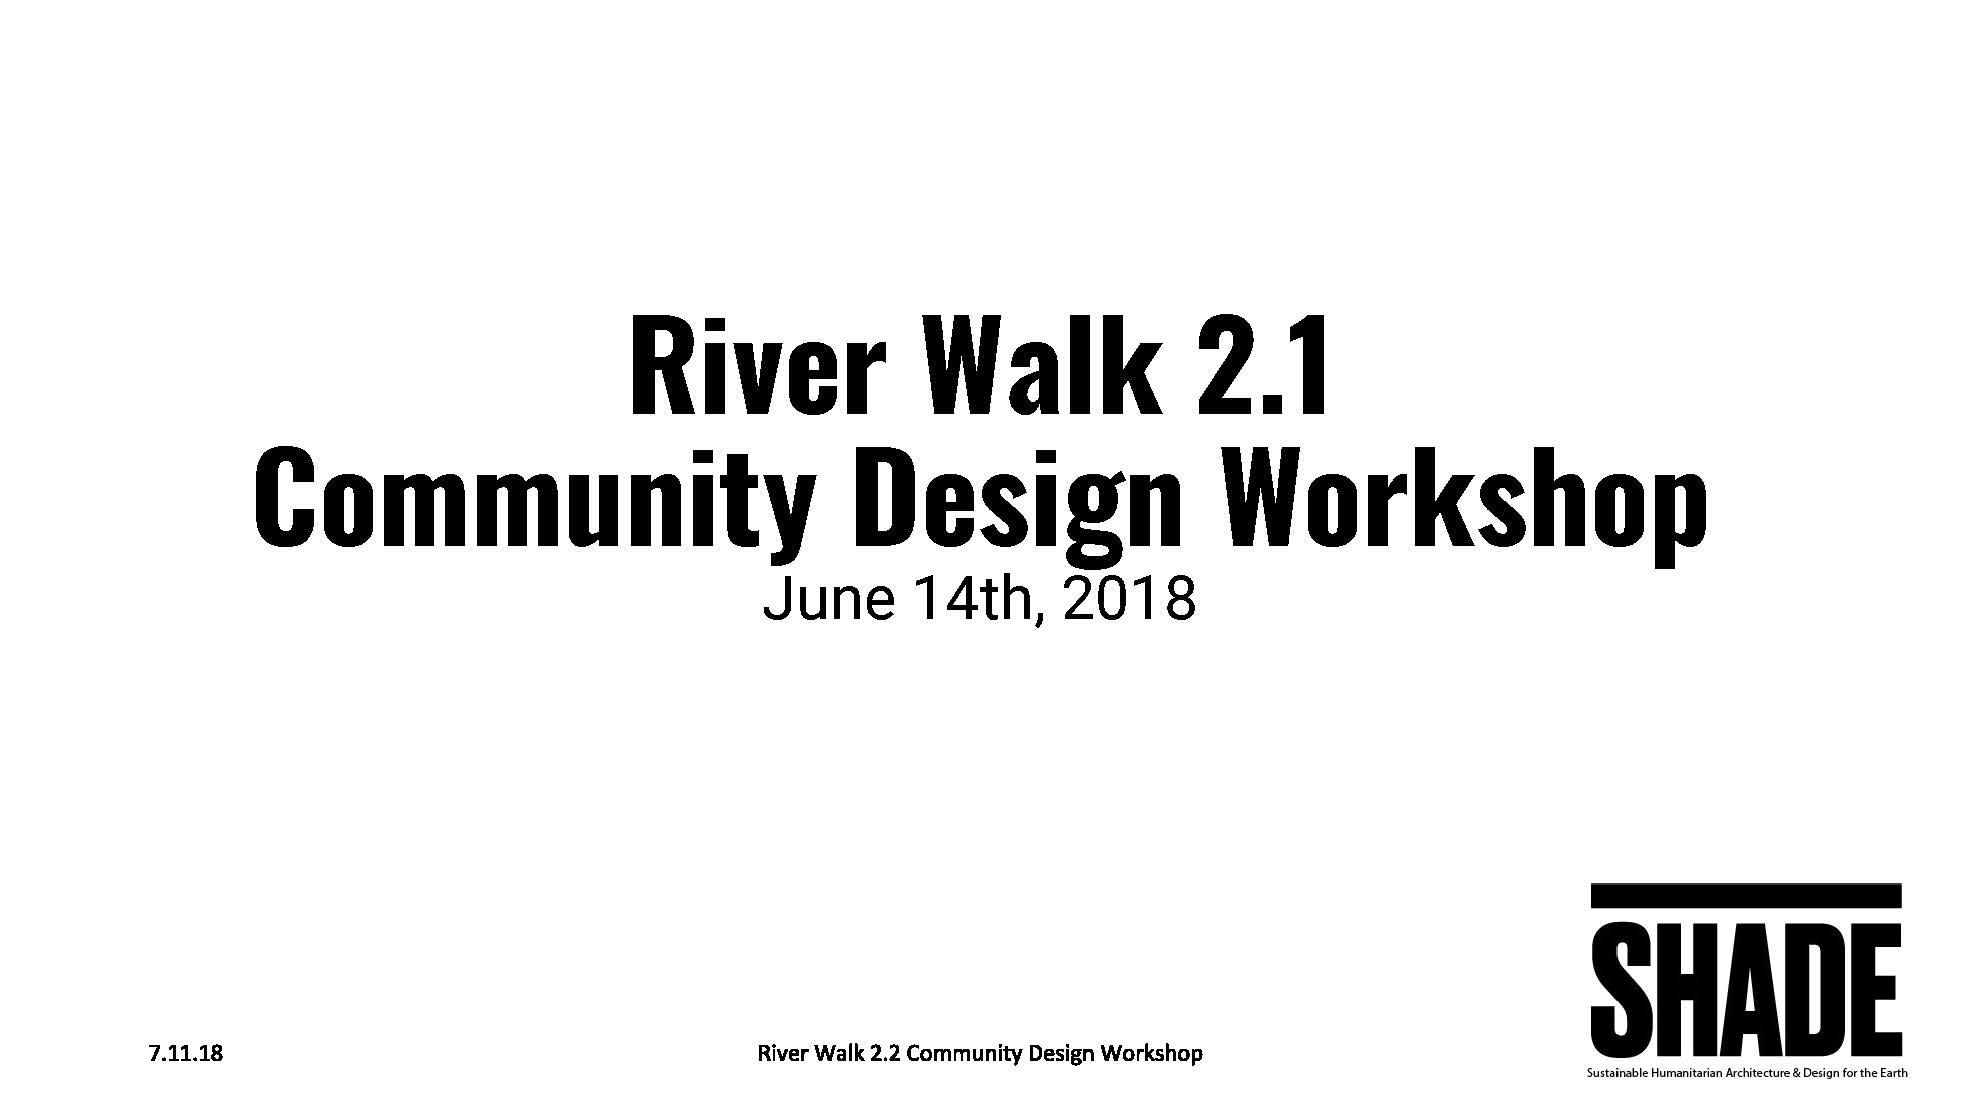 River Walk CDW 7.11.18 (1)_Page_03.jpg